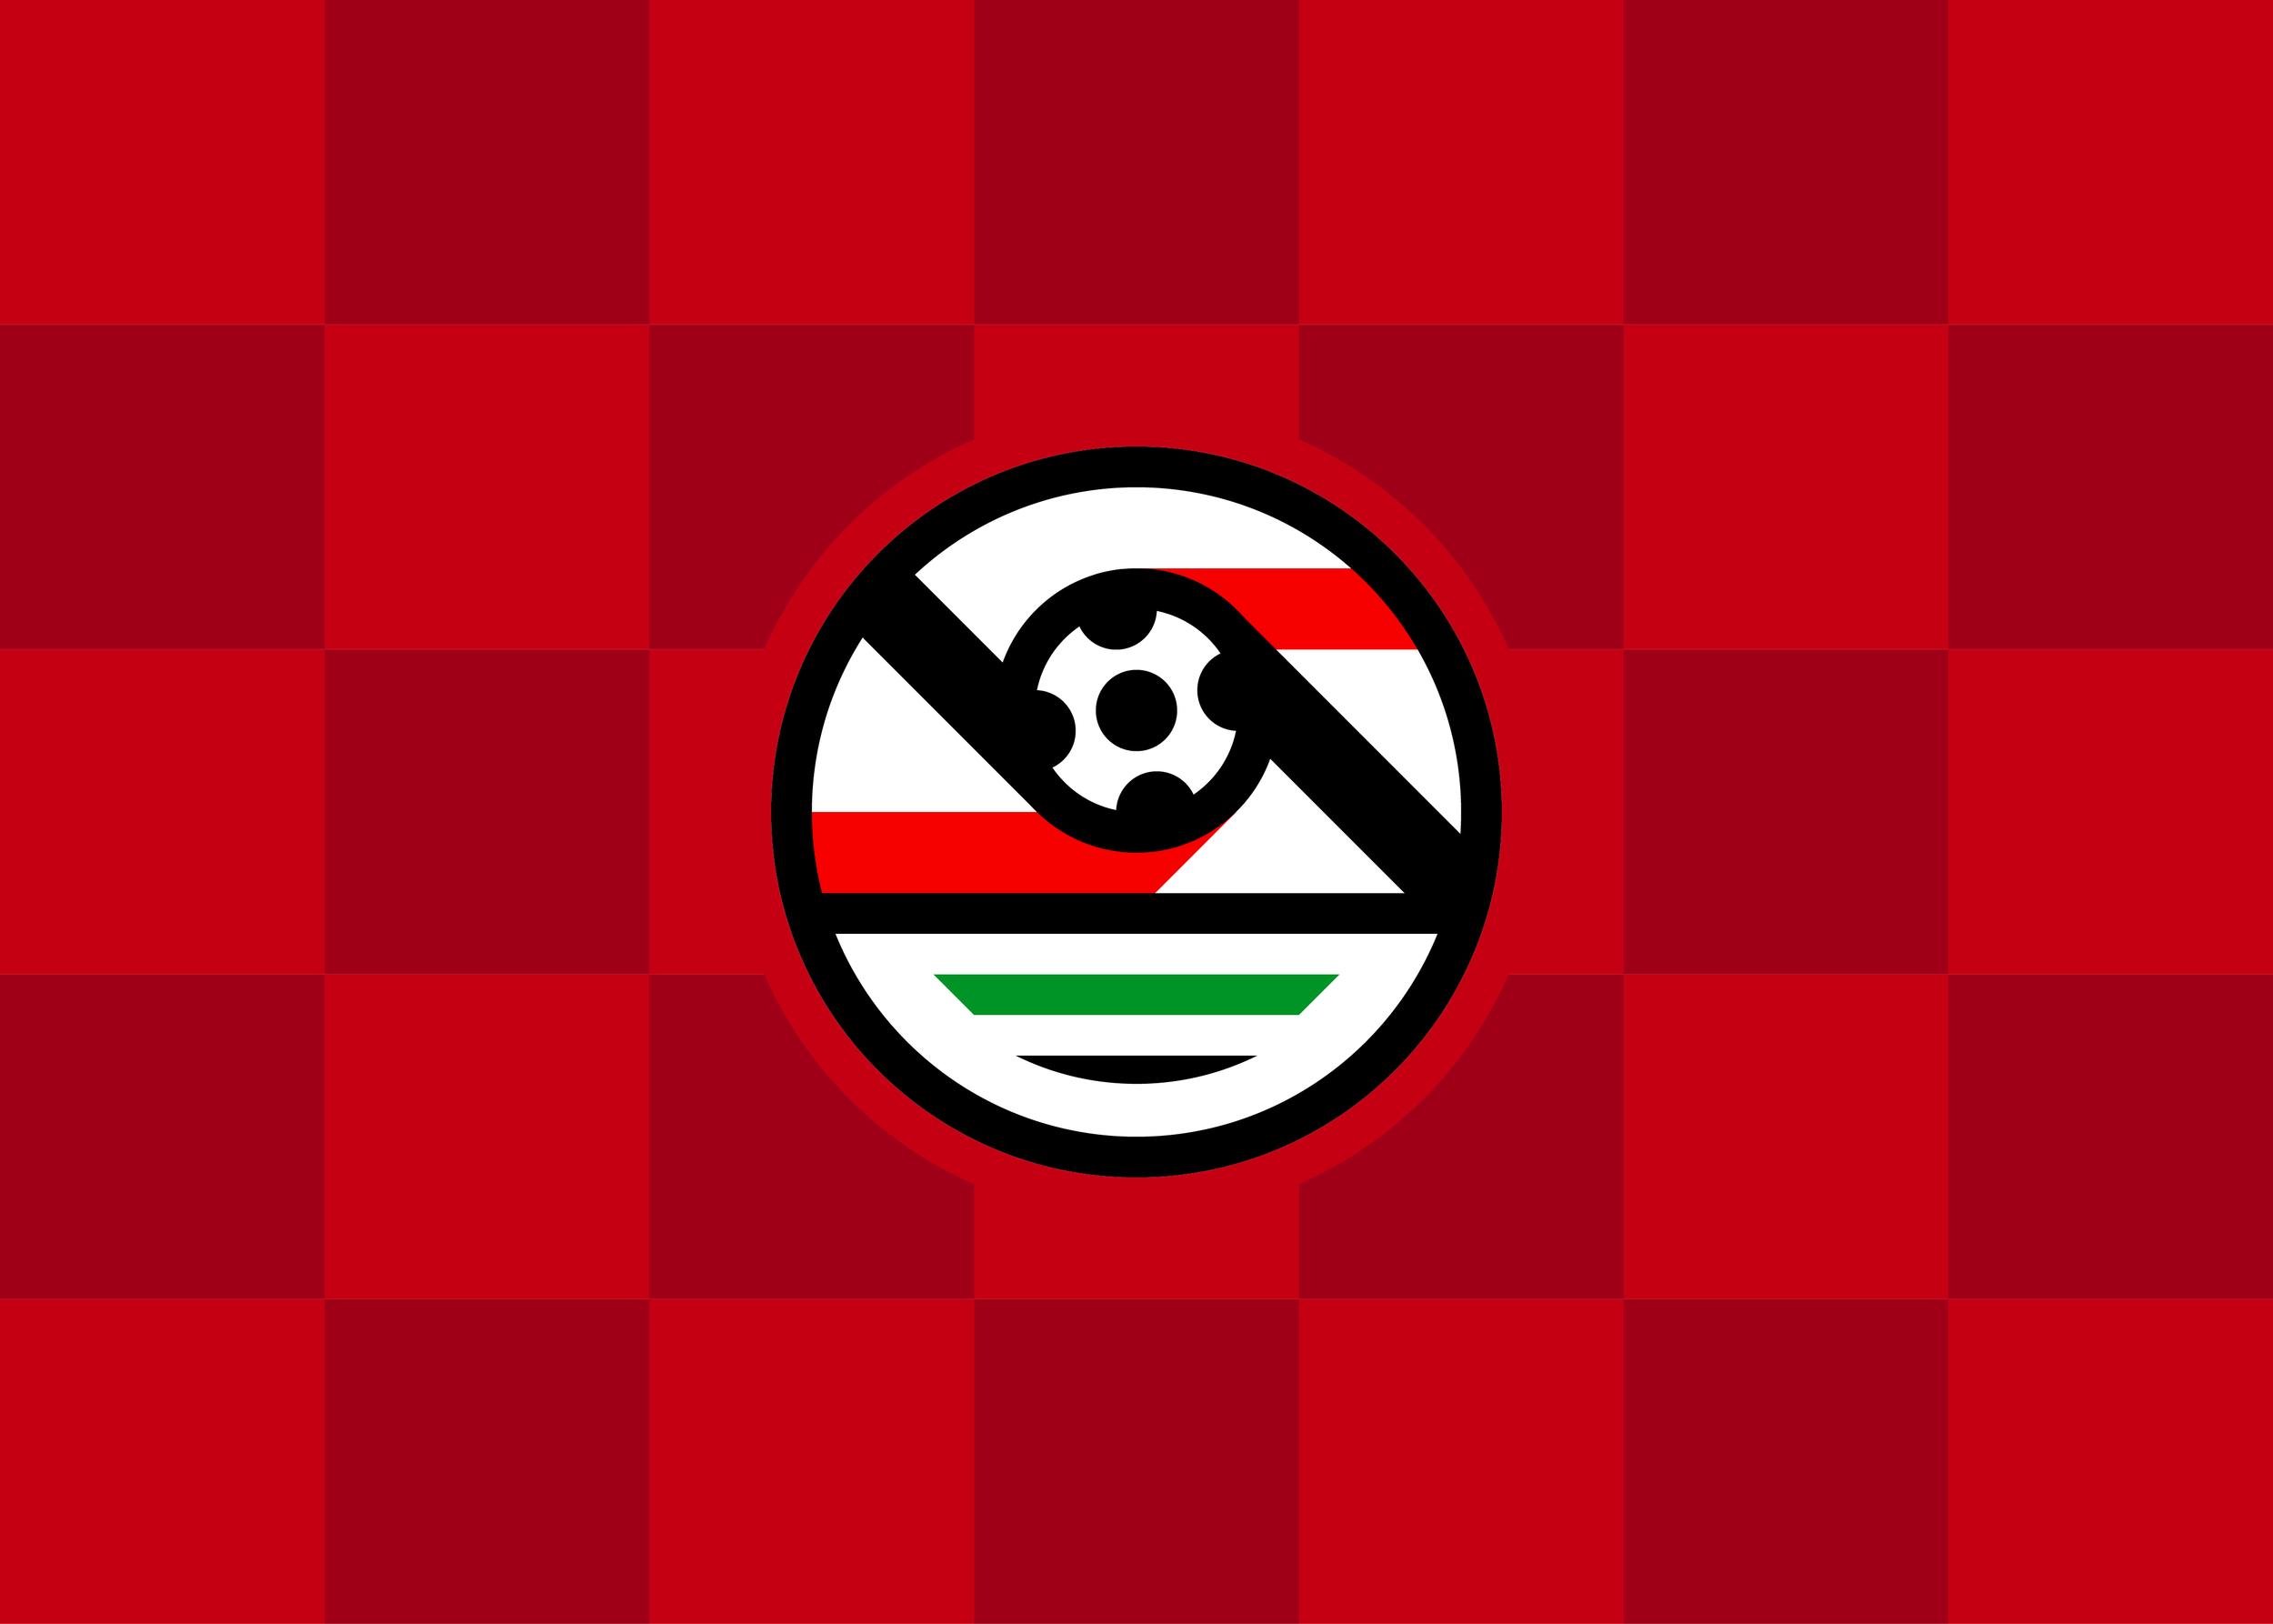 Egypt-Geometric-World-Cup-Football-Badge-01-Logo-Design-Freelance-Kent.png